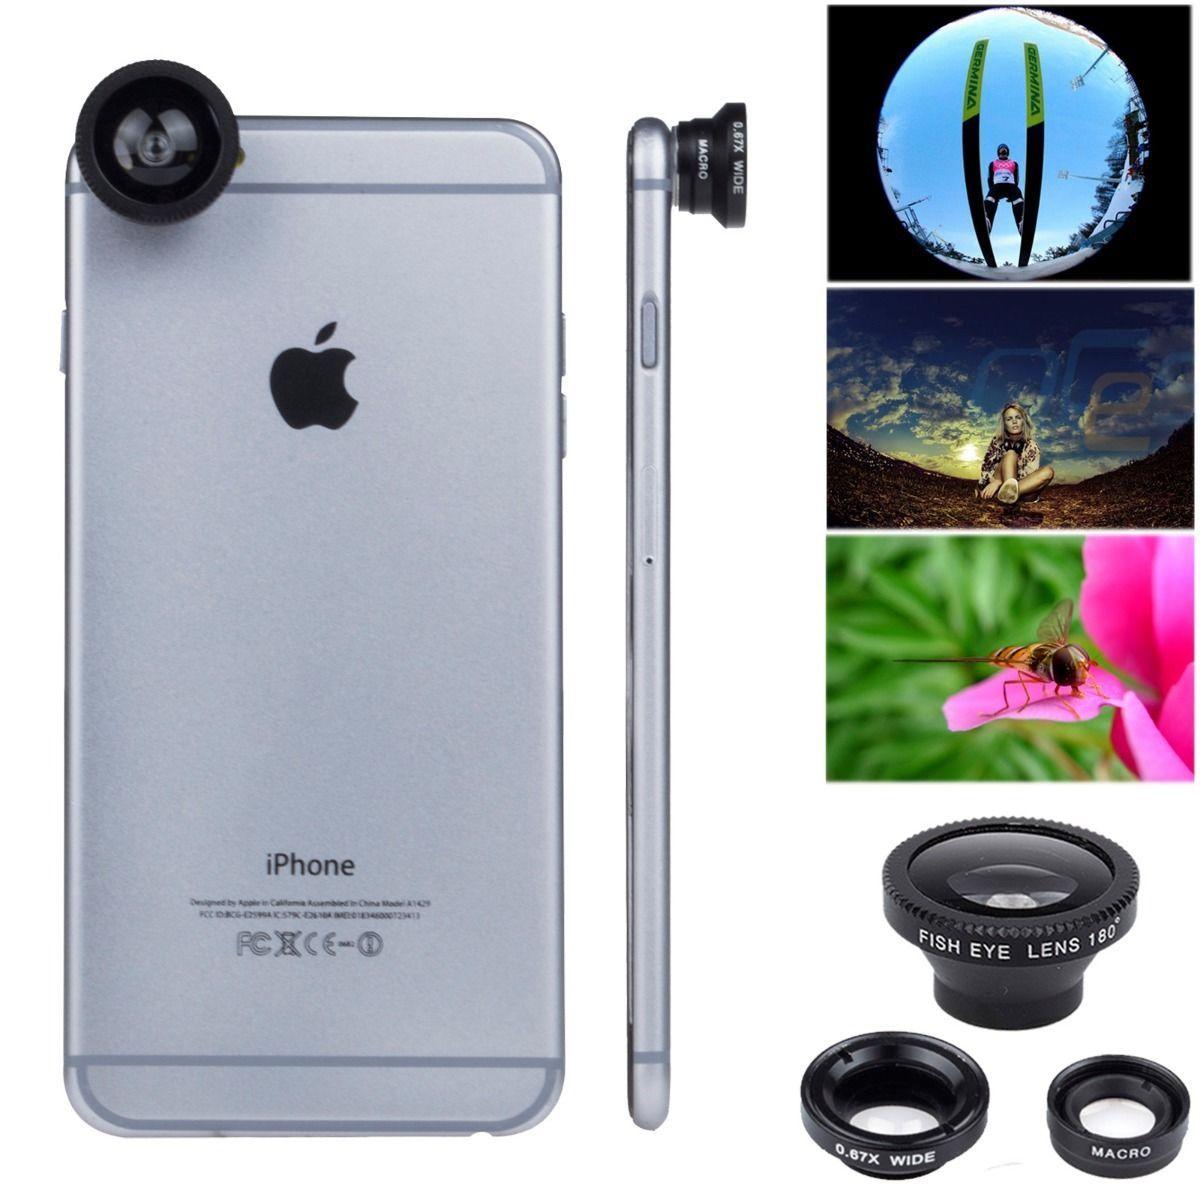 d7076f1c296 Compre 3 In 1 Kit Lente De Cámara Magnética Ojo De Pez + Gran Angular +  Macro Para Iphone 5 5s 6 Plus A $3.52 Del Rongtong | Dhgate.Com